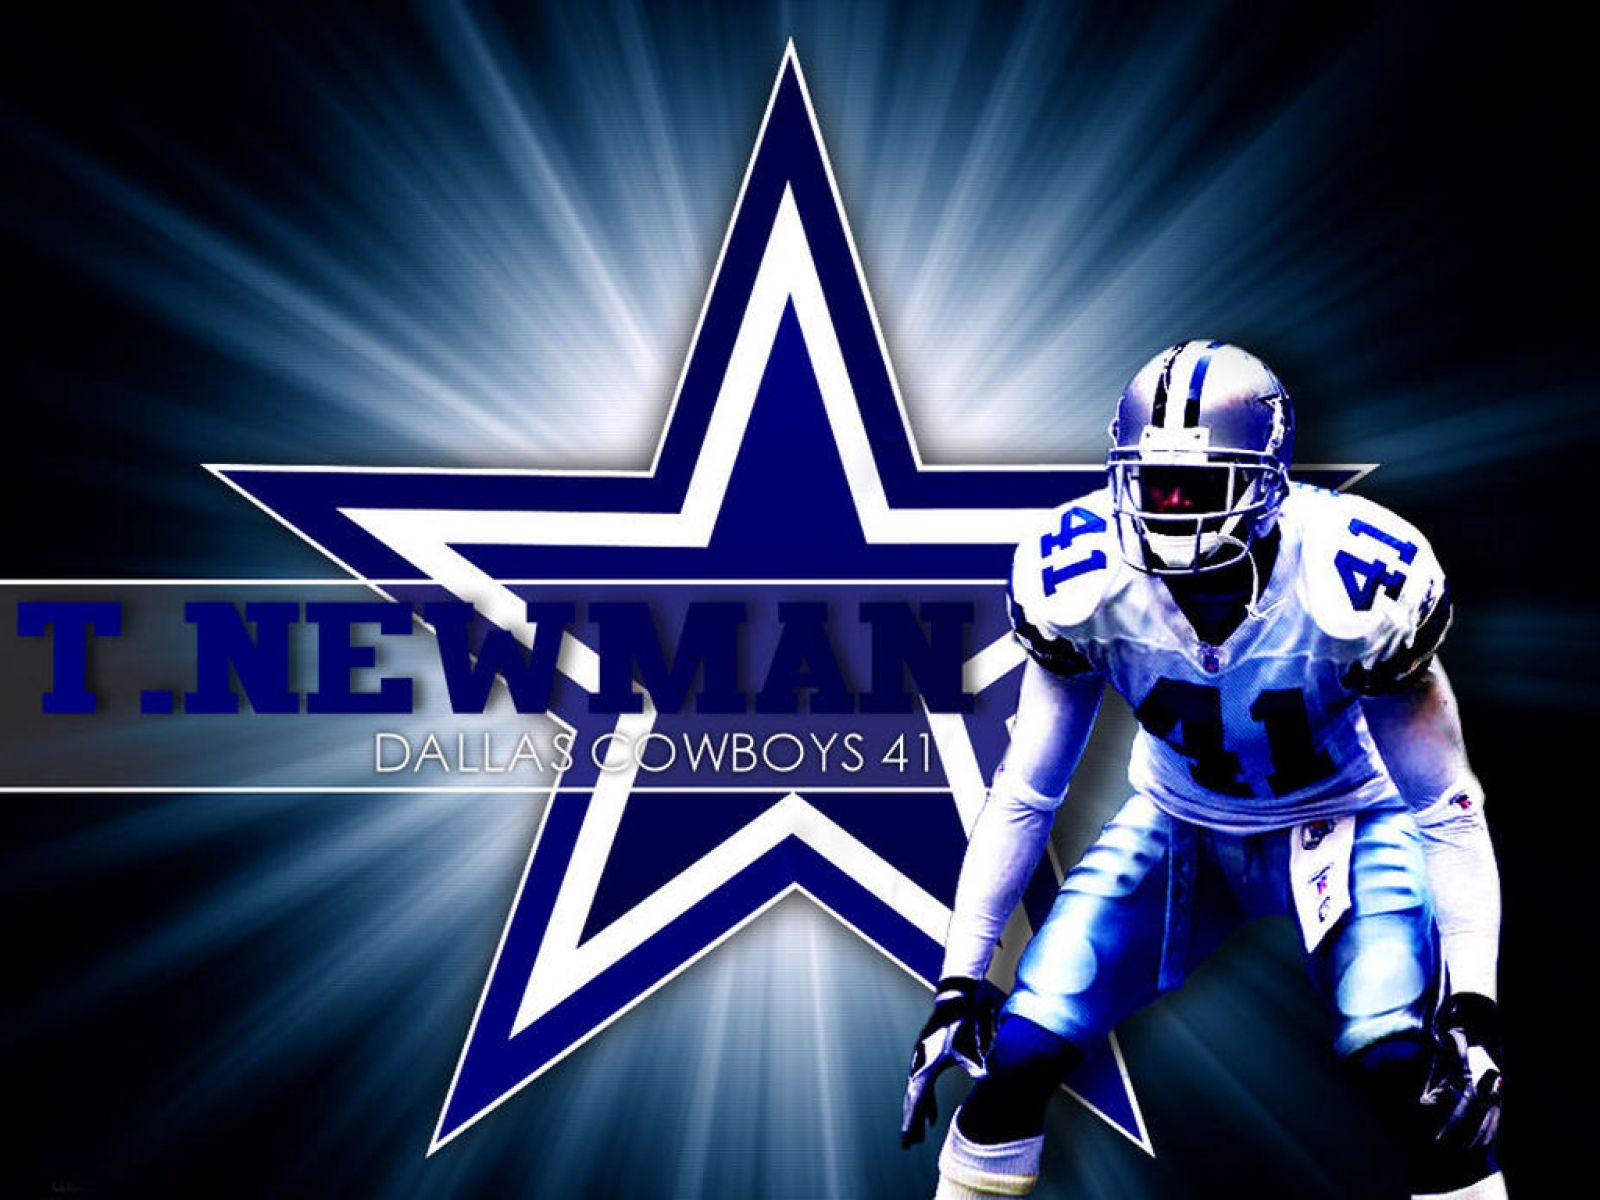 Dallas Cowboys Wallpapers Download 1600x1200